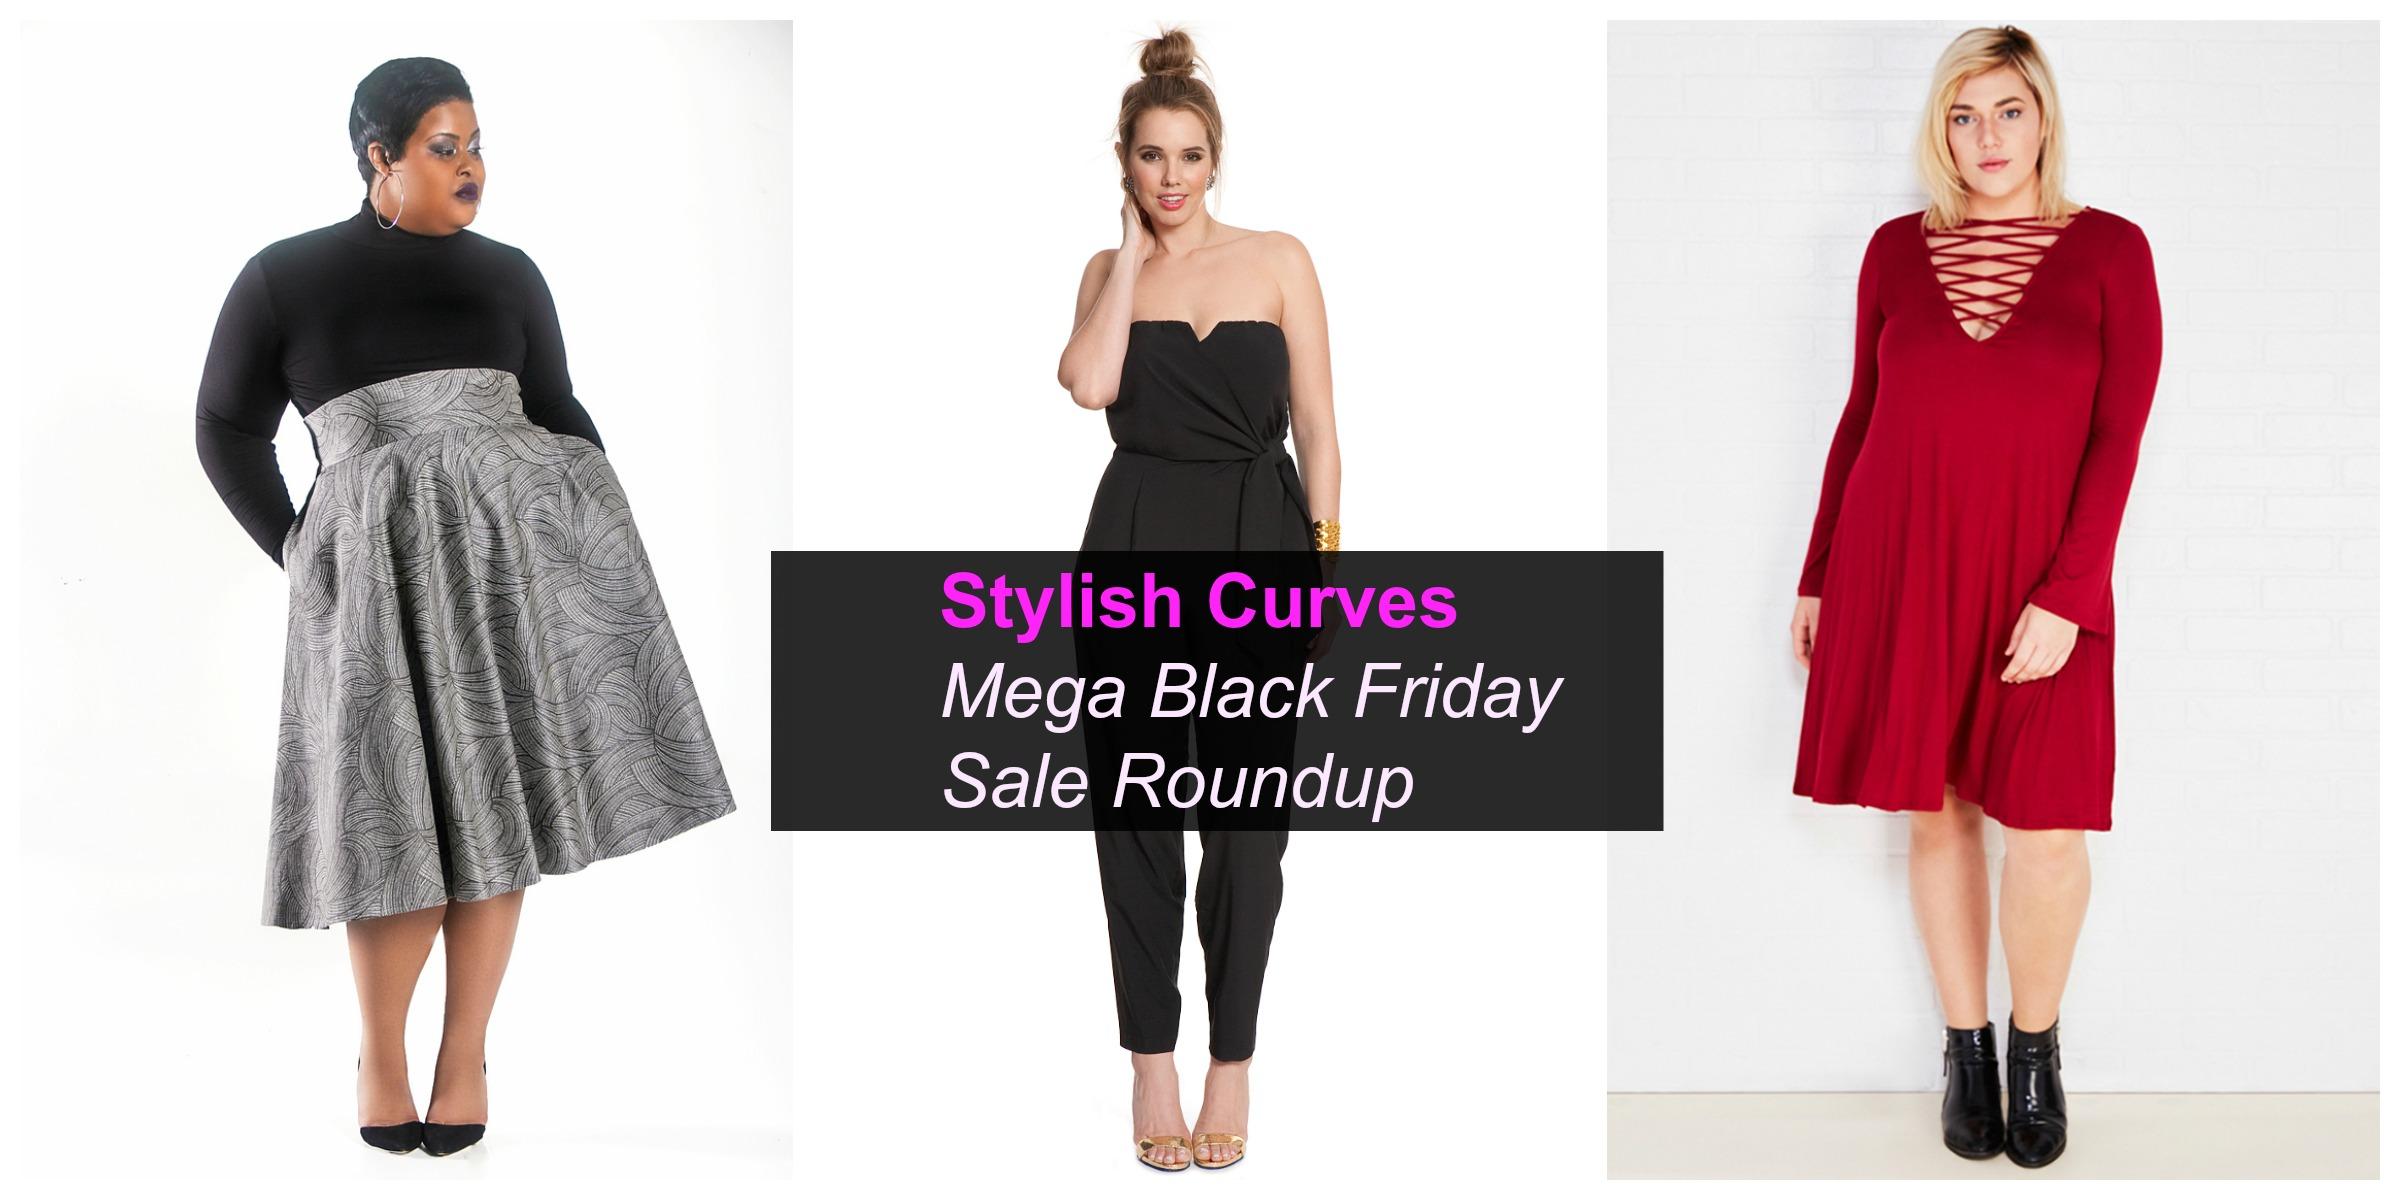 Our Mega Plus Size Black Friday Sale Roundup